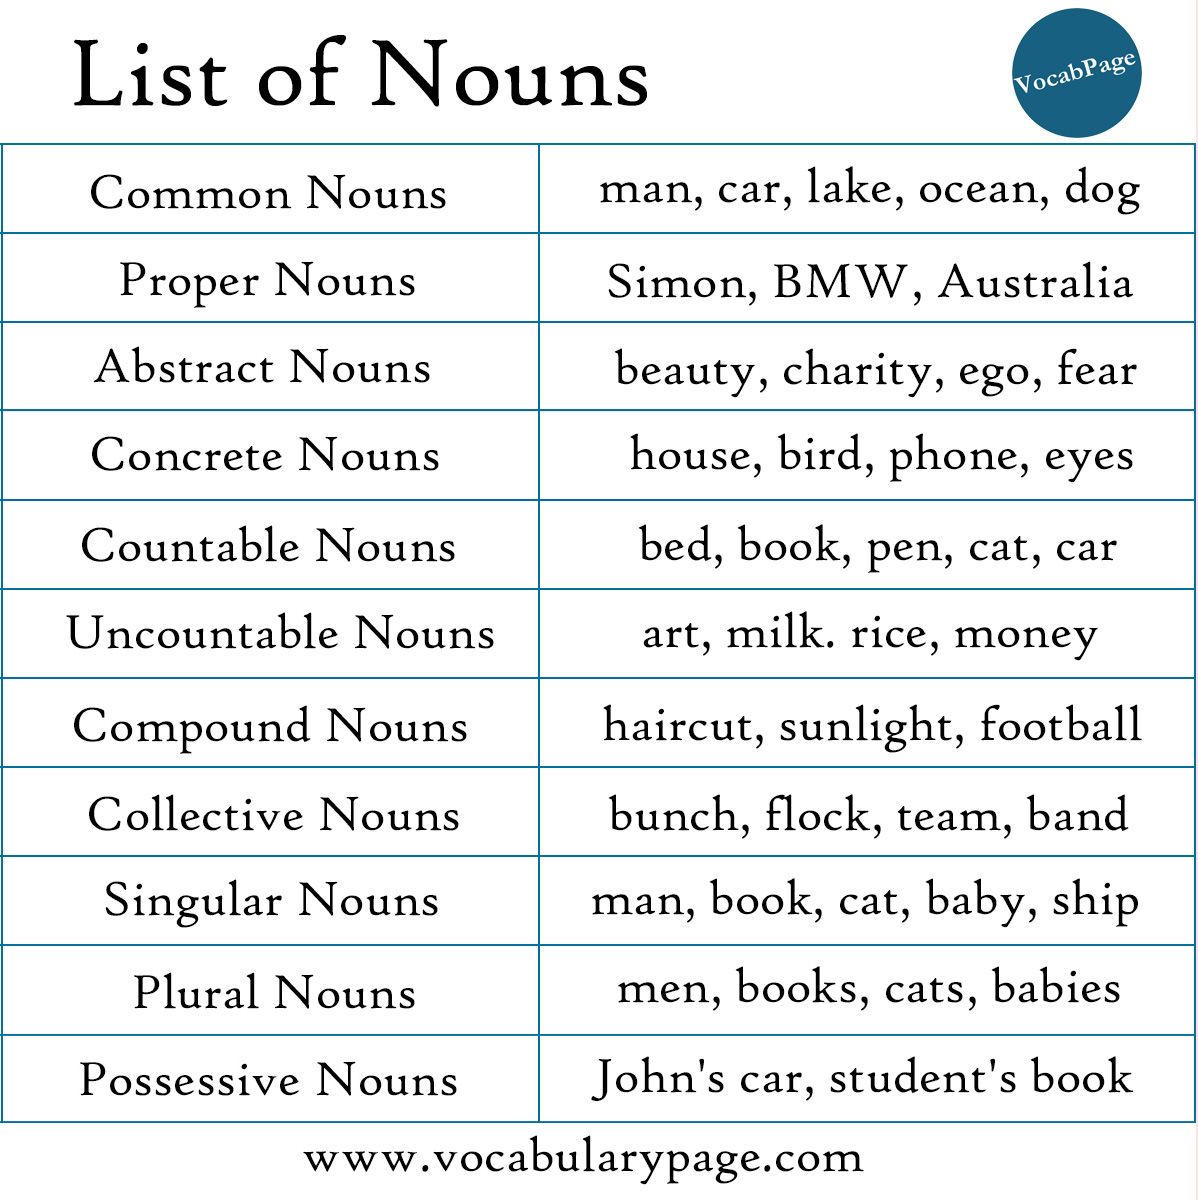 Worksheets Person Nouns List listofnouns jpg list of nouns